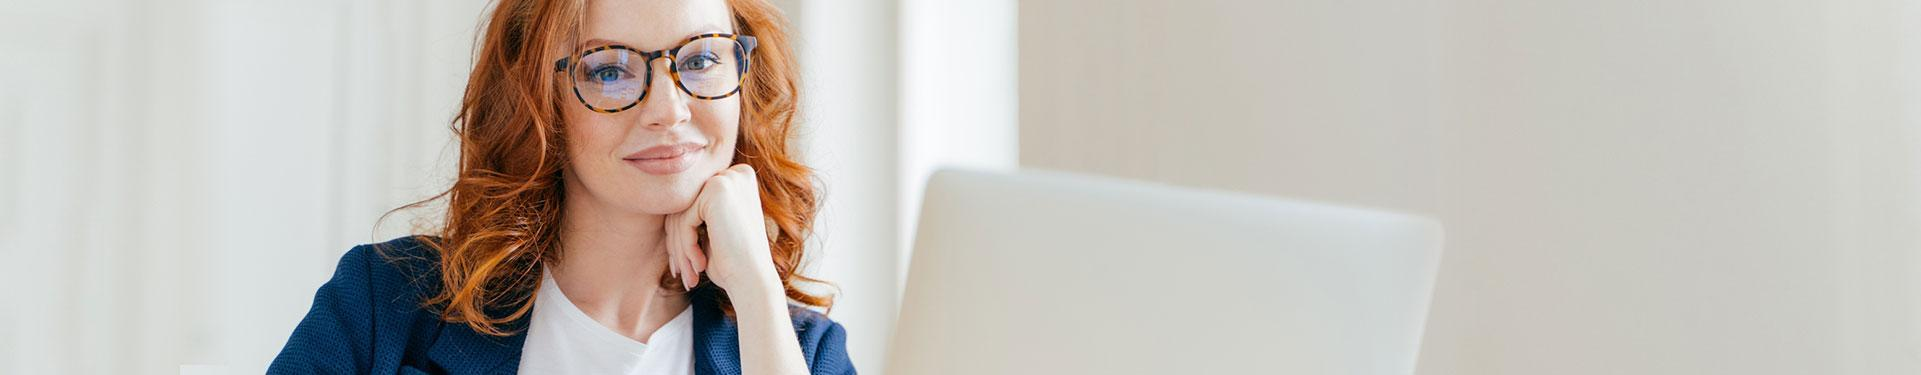 banner kontakt - kobieta patrząca na laptop